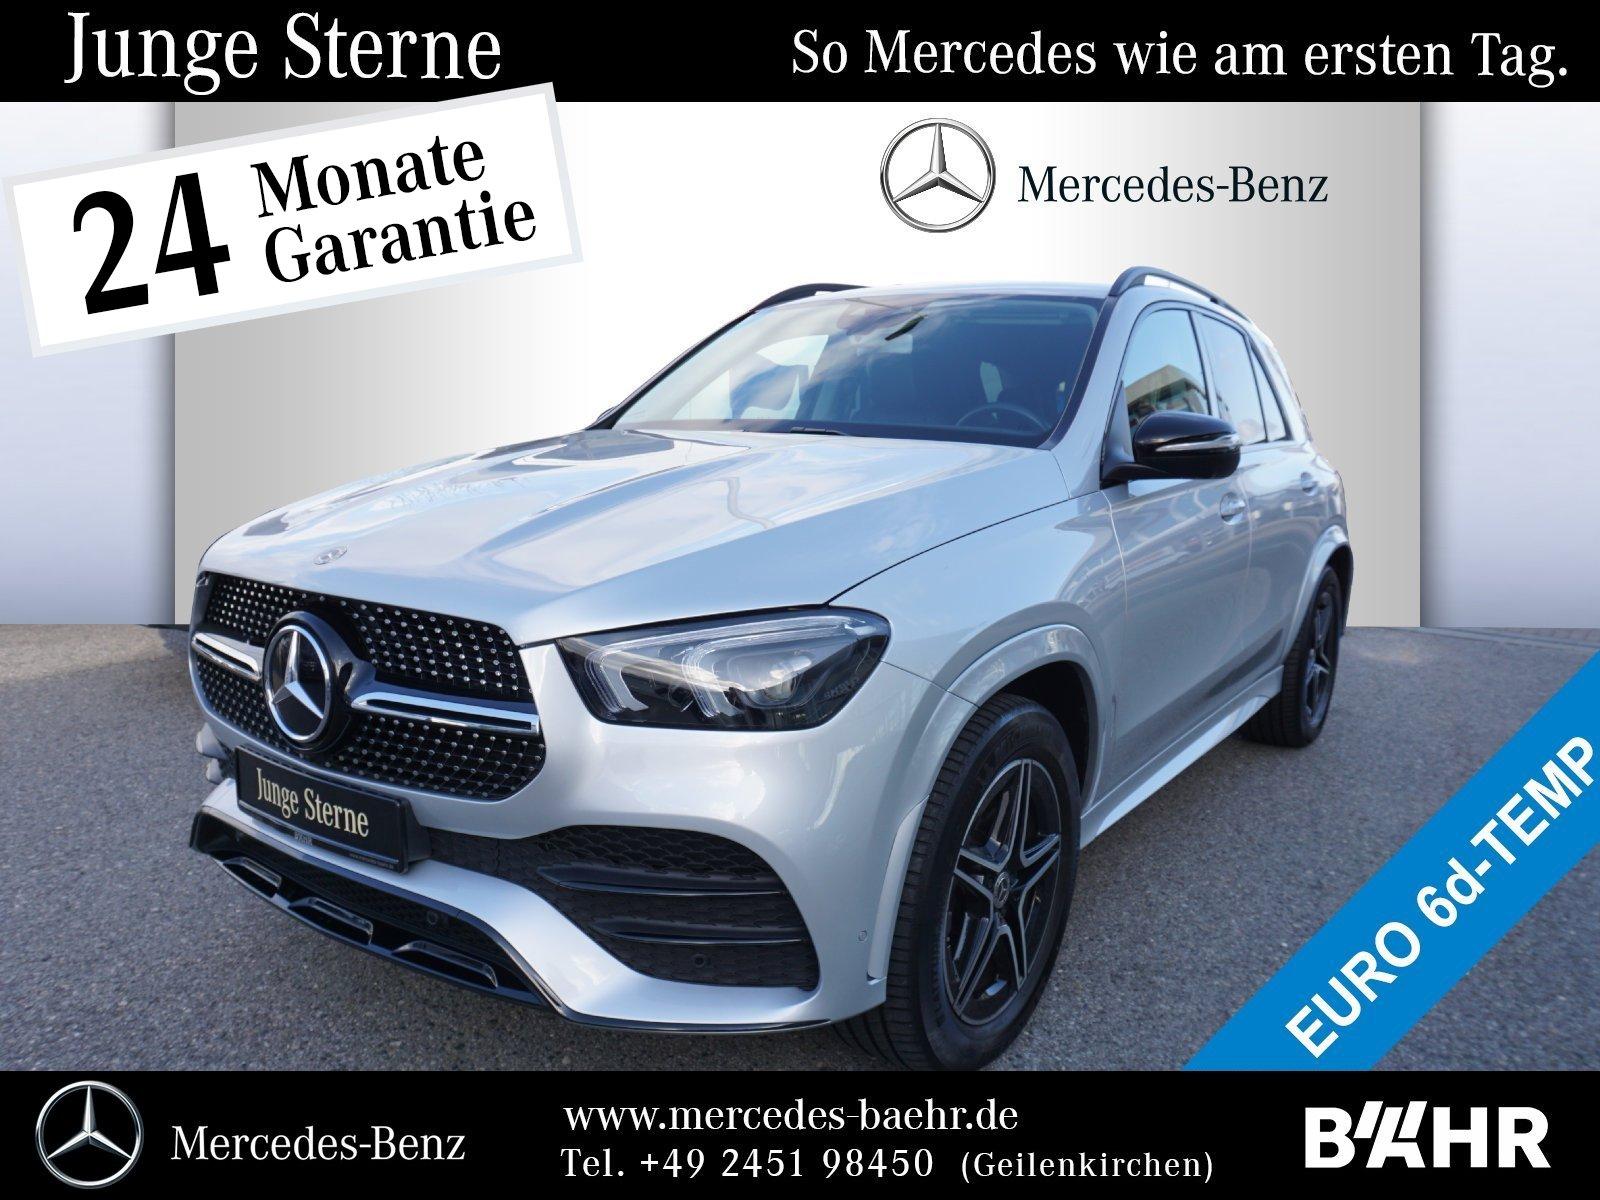 Mercedes-Benz GLE 300 d 4M AMG+Night/MBUX-Navi/LED/360°/Wide, Jahr 2019, Diesel